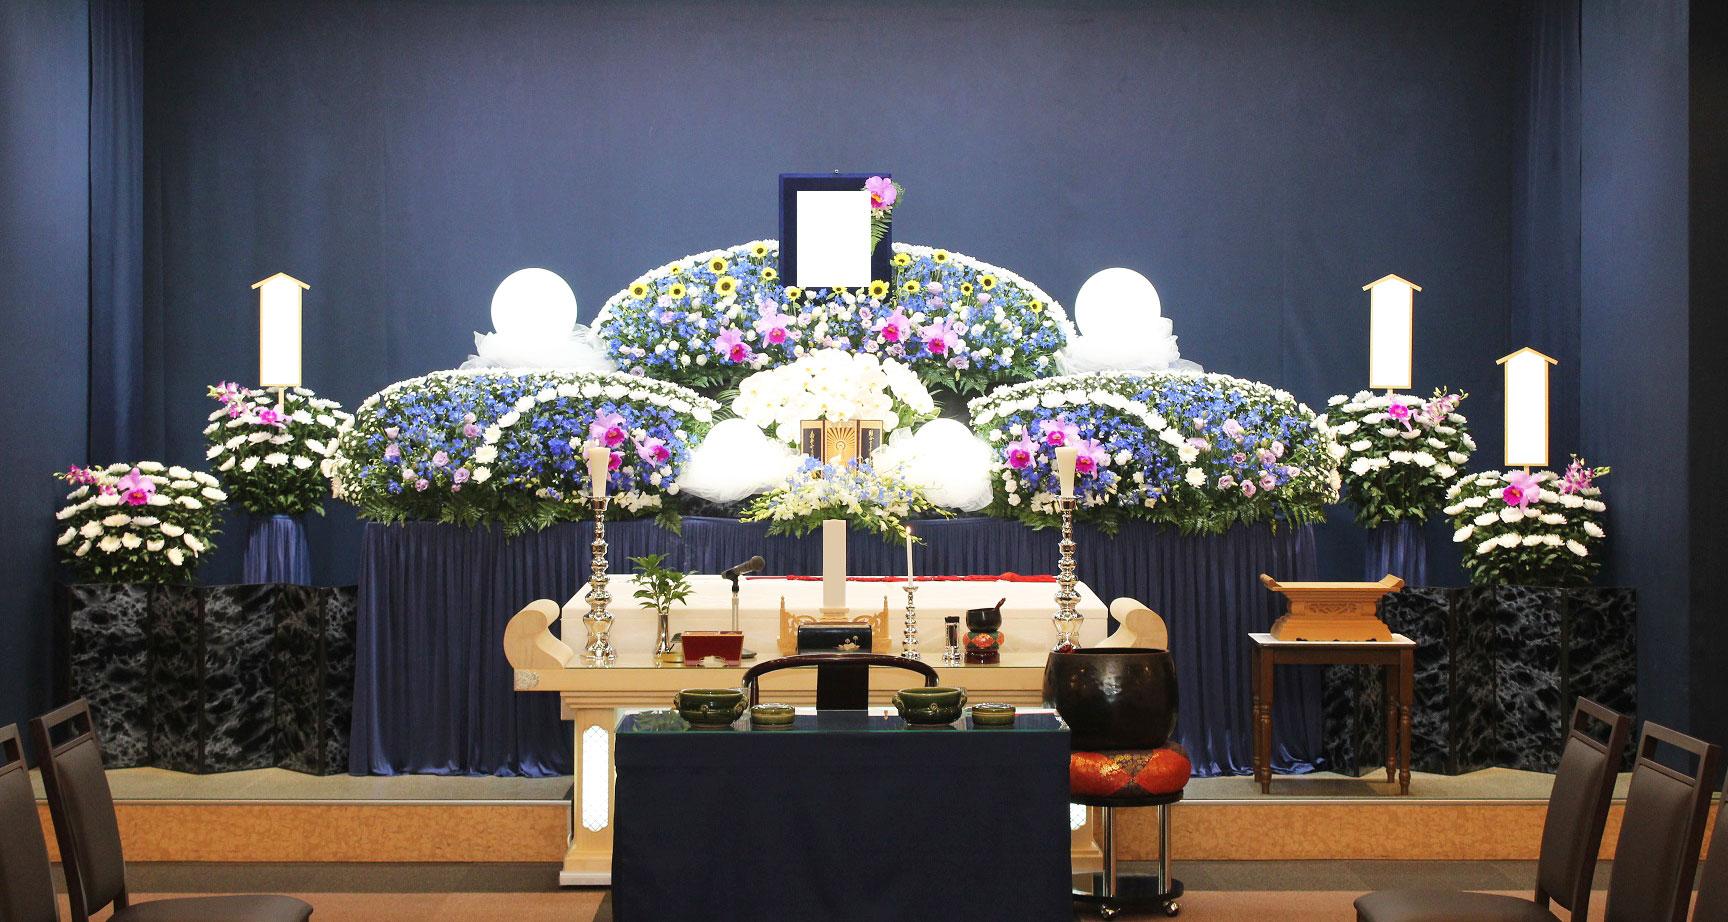 【お客様の声】T様(横浜市文庫斎場)